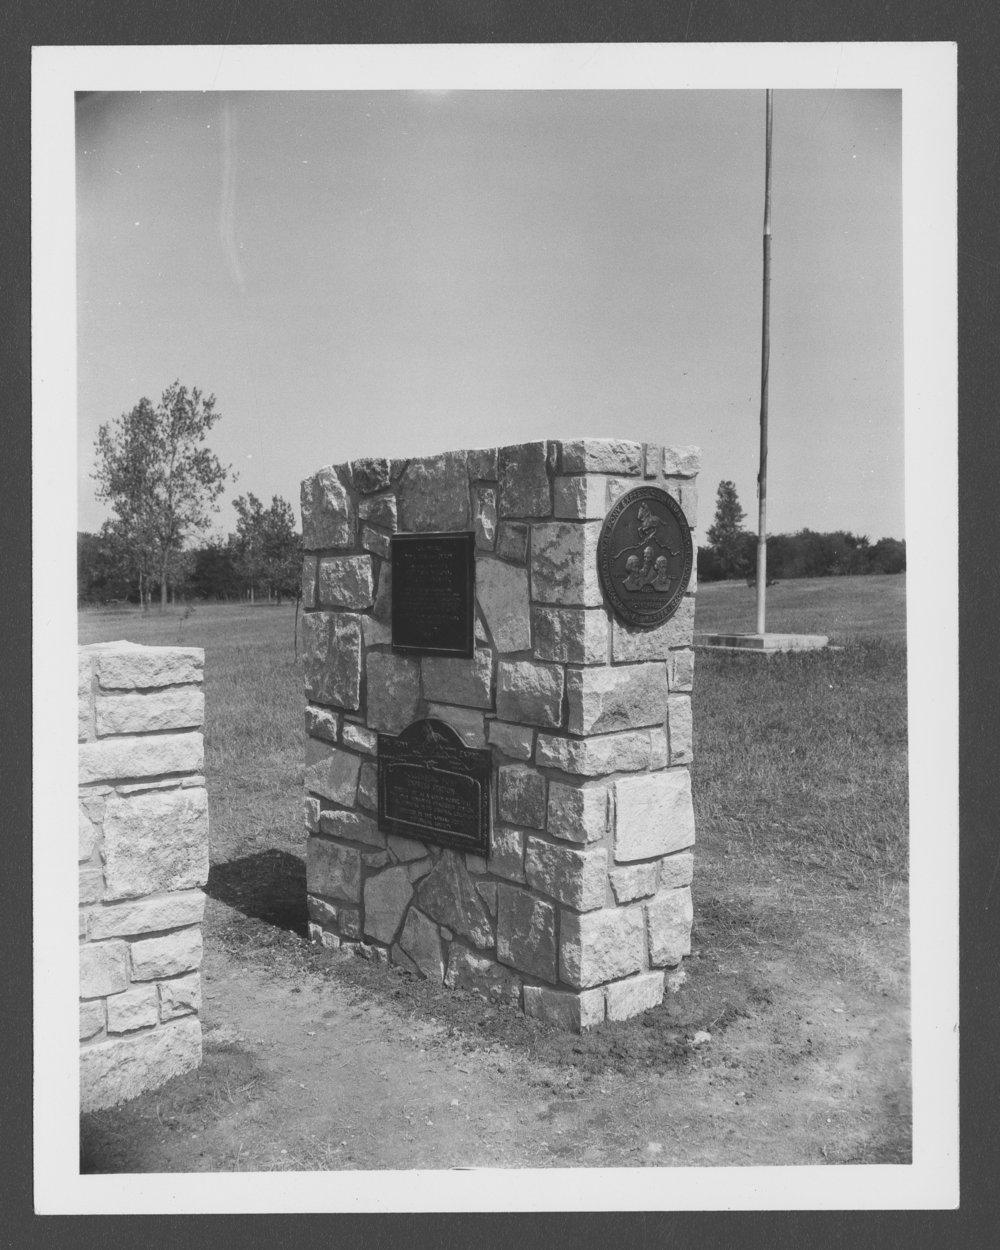 Dedication of the Pony Express monument, Washington County, Kansas - 1 [*5]